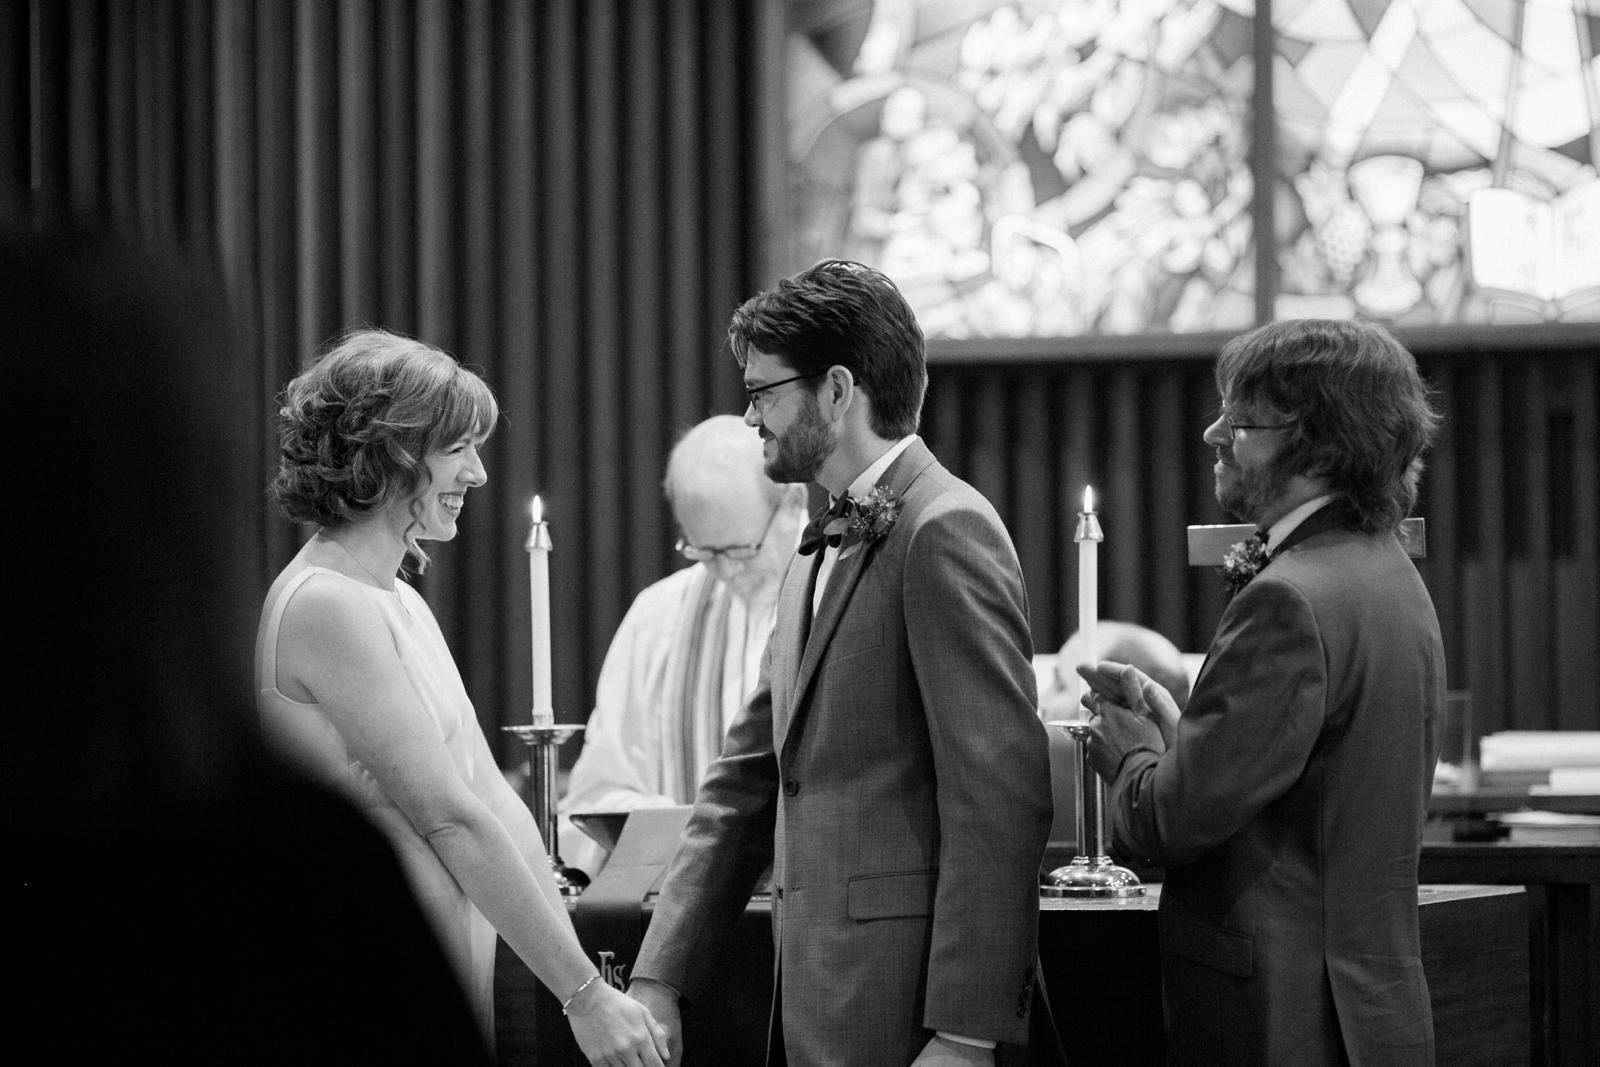 ringwood new jersey wedding photographer shannon griffin_0037.jpg